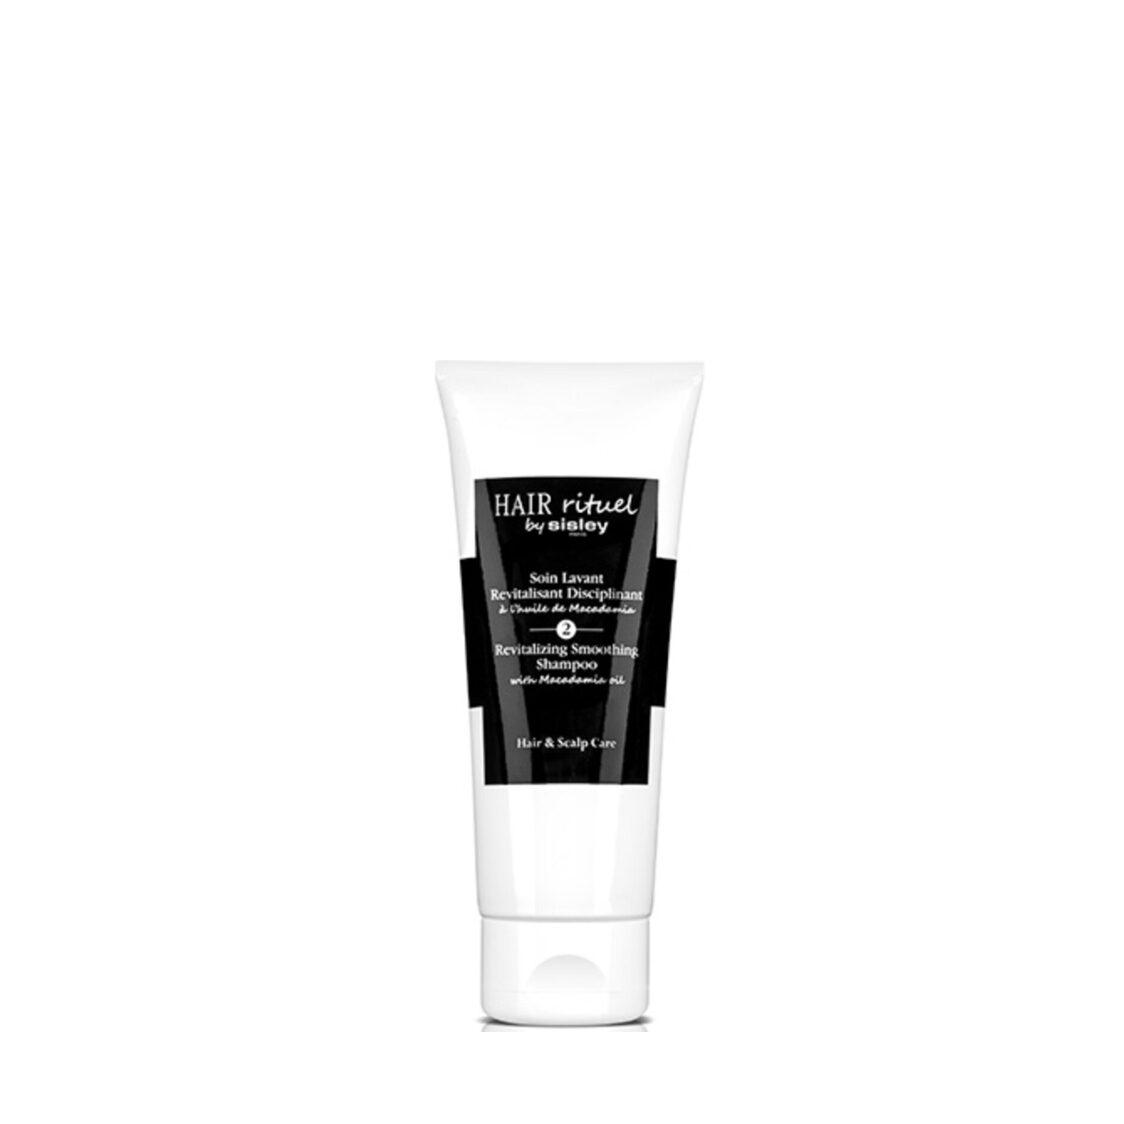 Sisley Revitalizing Smoothing Shampoo With Macadamia Oil 200ml